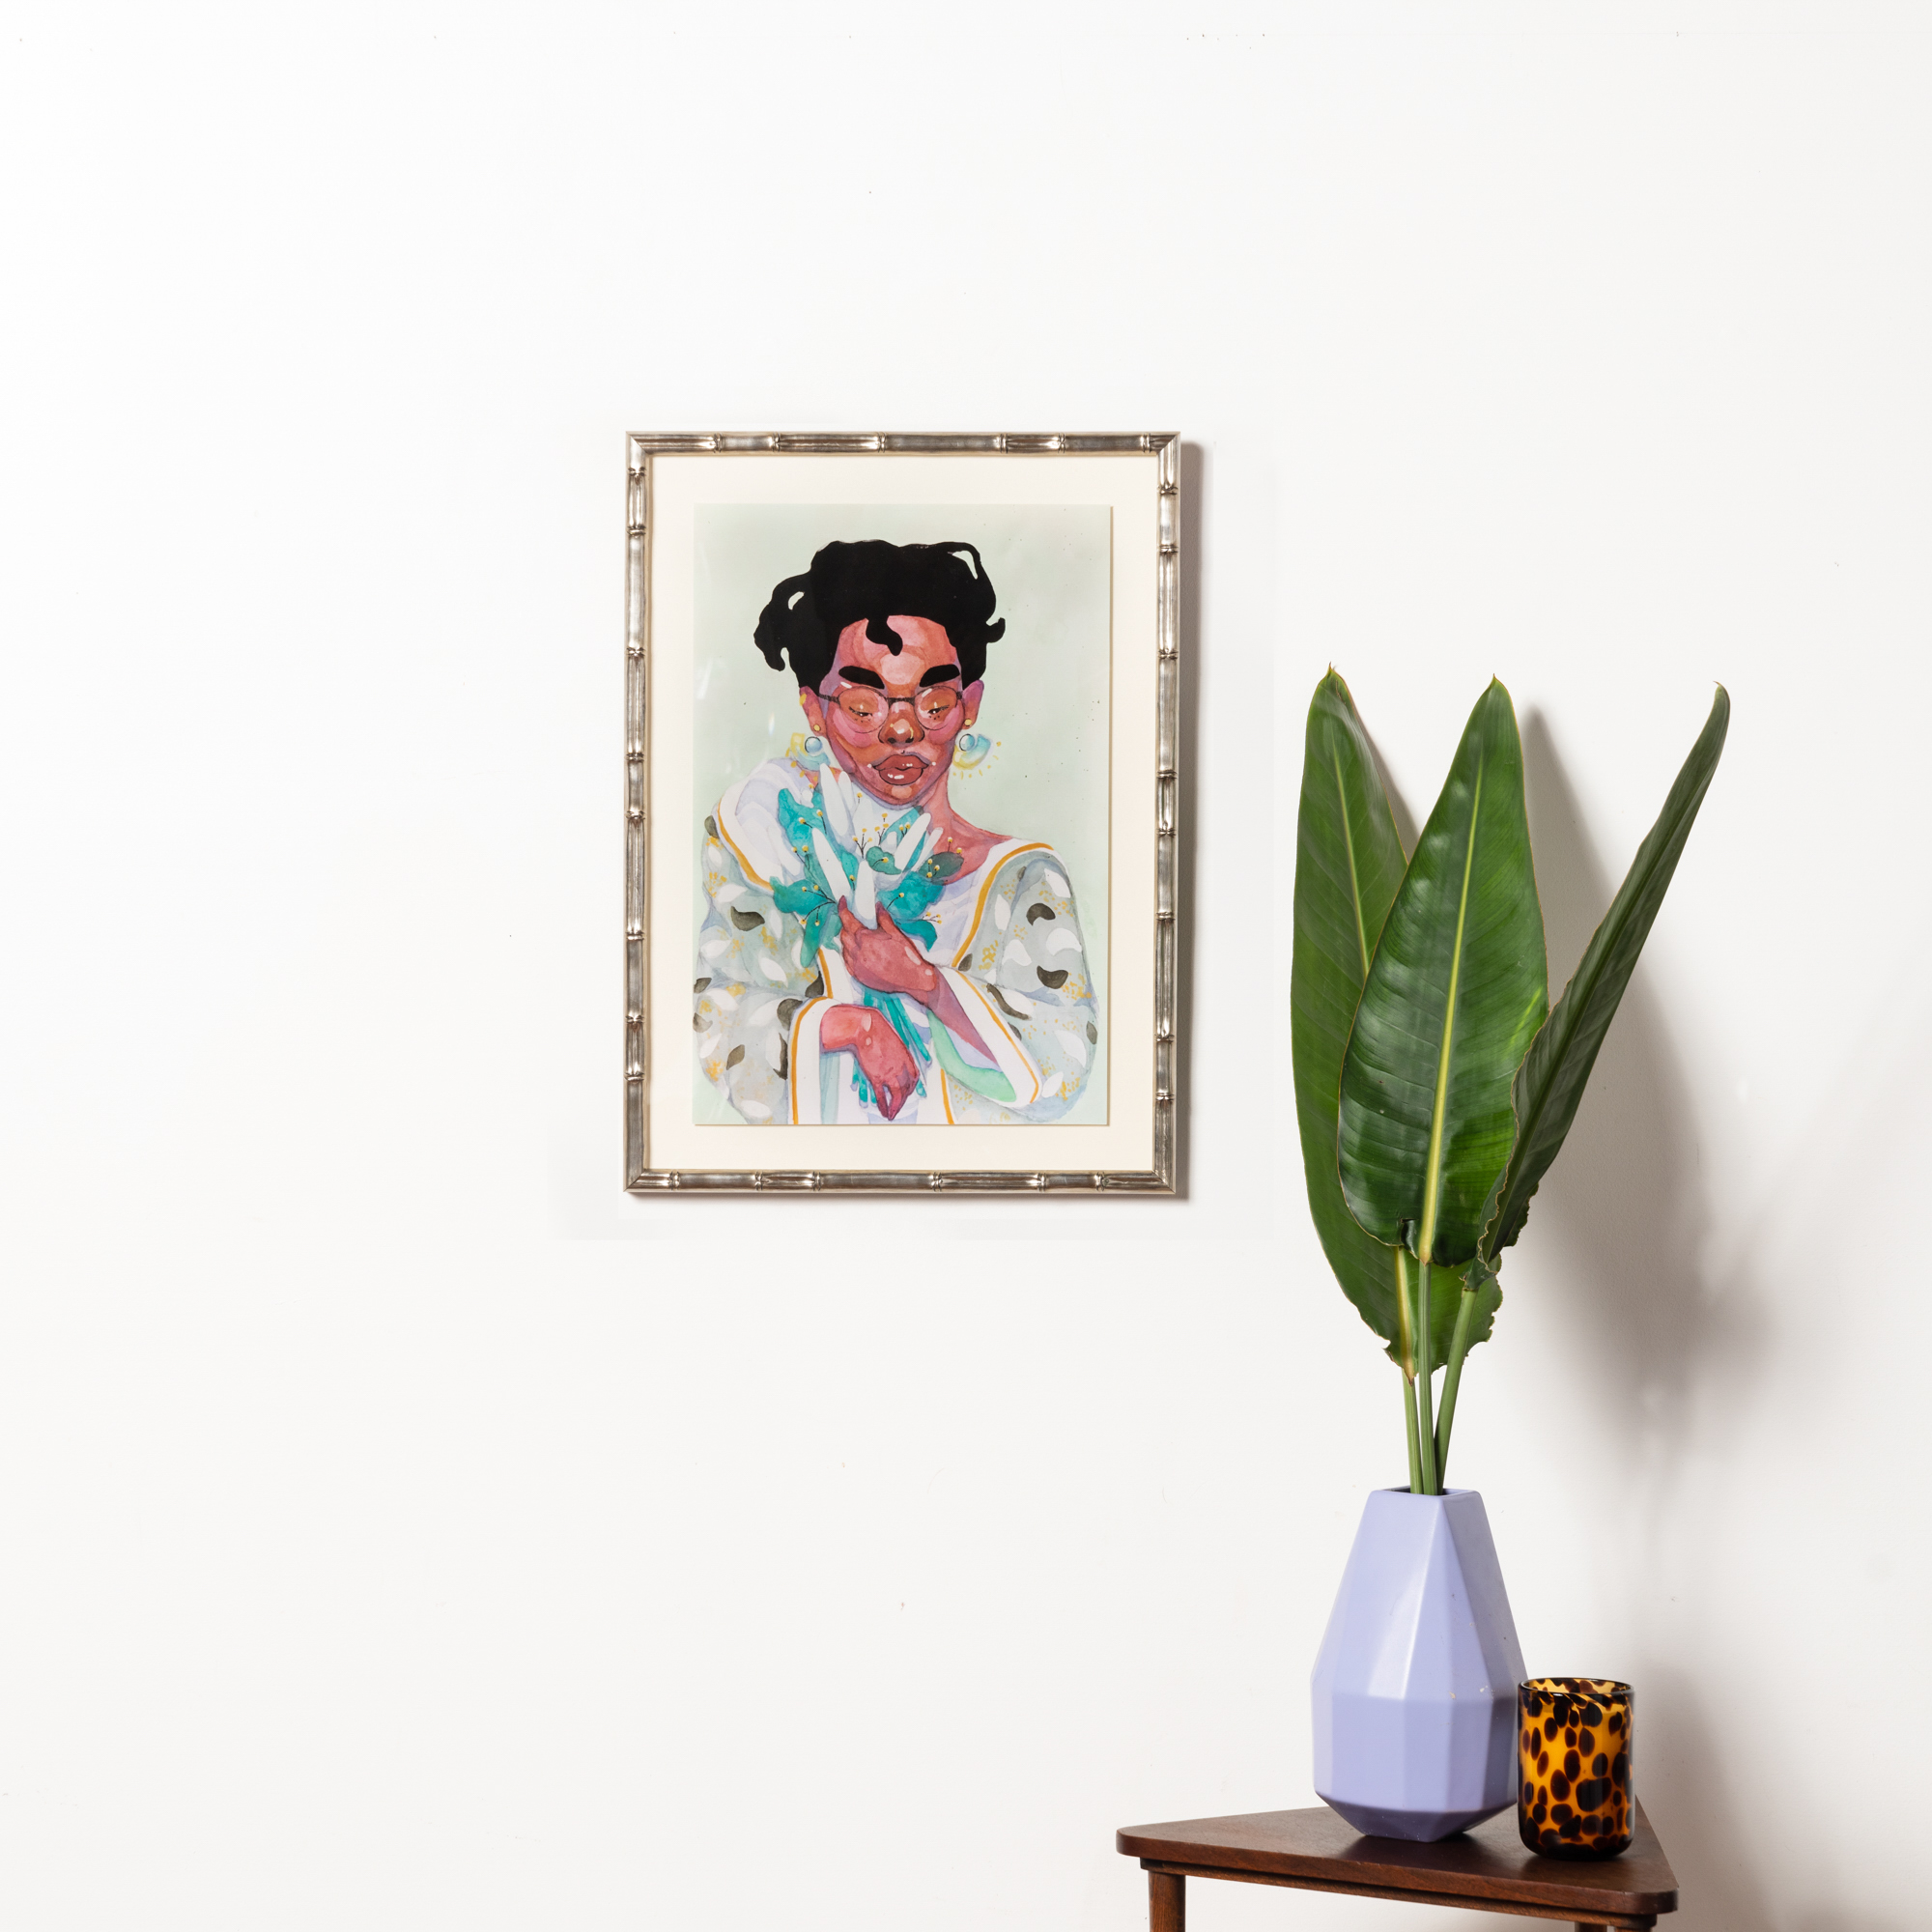 Framebridge Black Artists Print Shop Chiomma Hall Plastic framed print Nassau frame